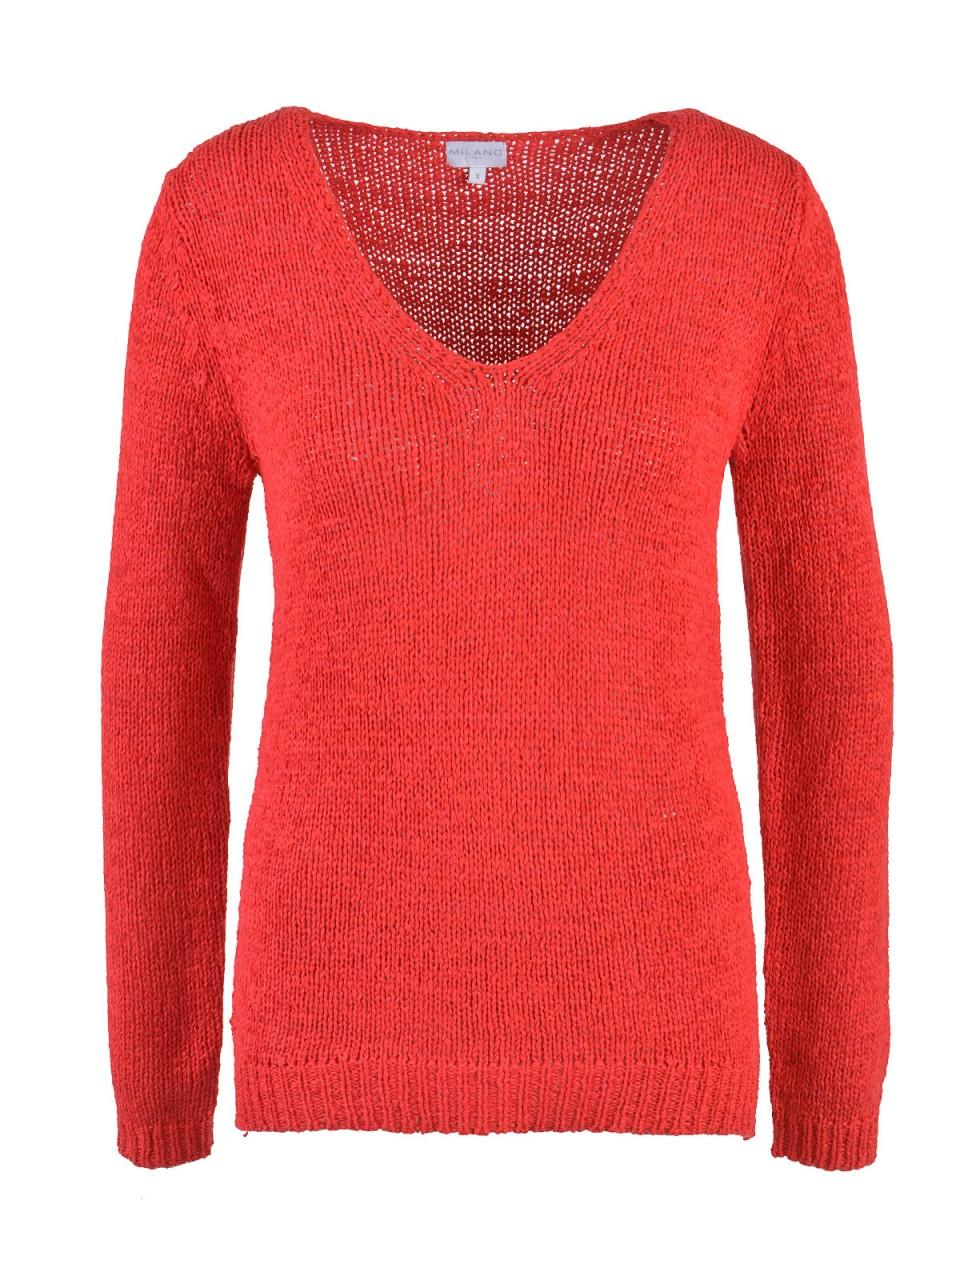 Oberteile - MILANO ITALY Damen Pullover, rot  - Onlineshop Designermode.com